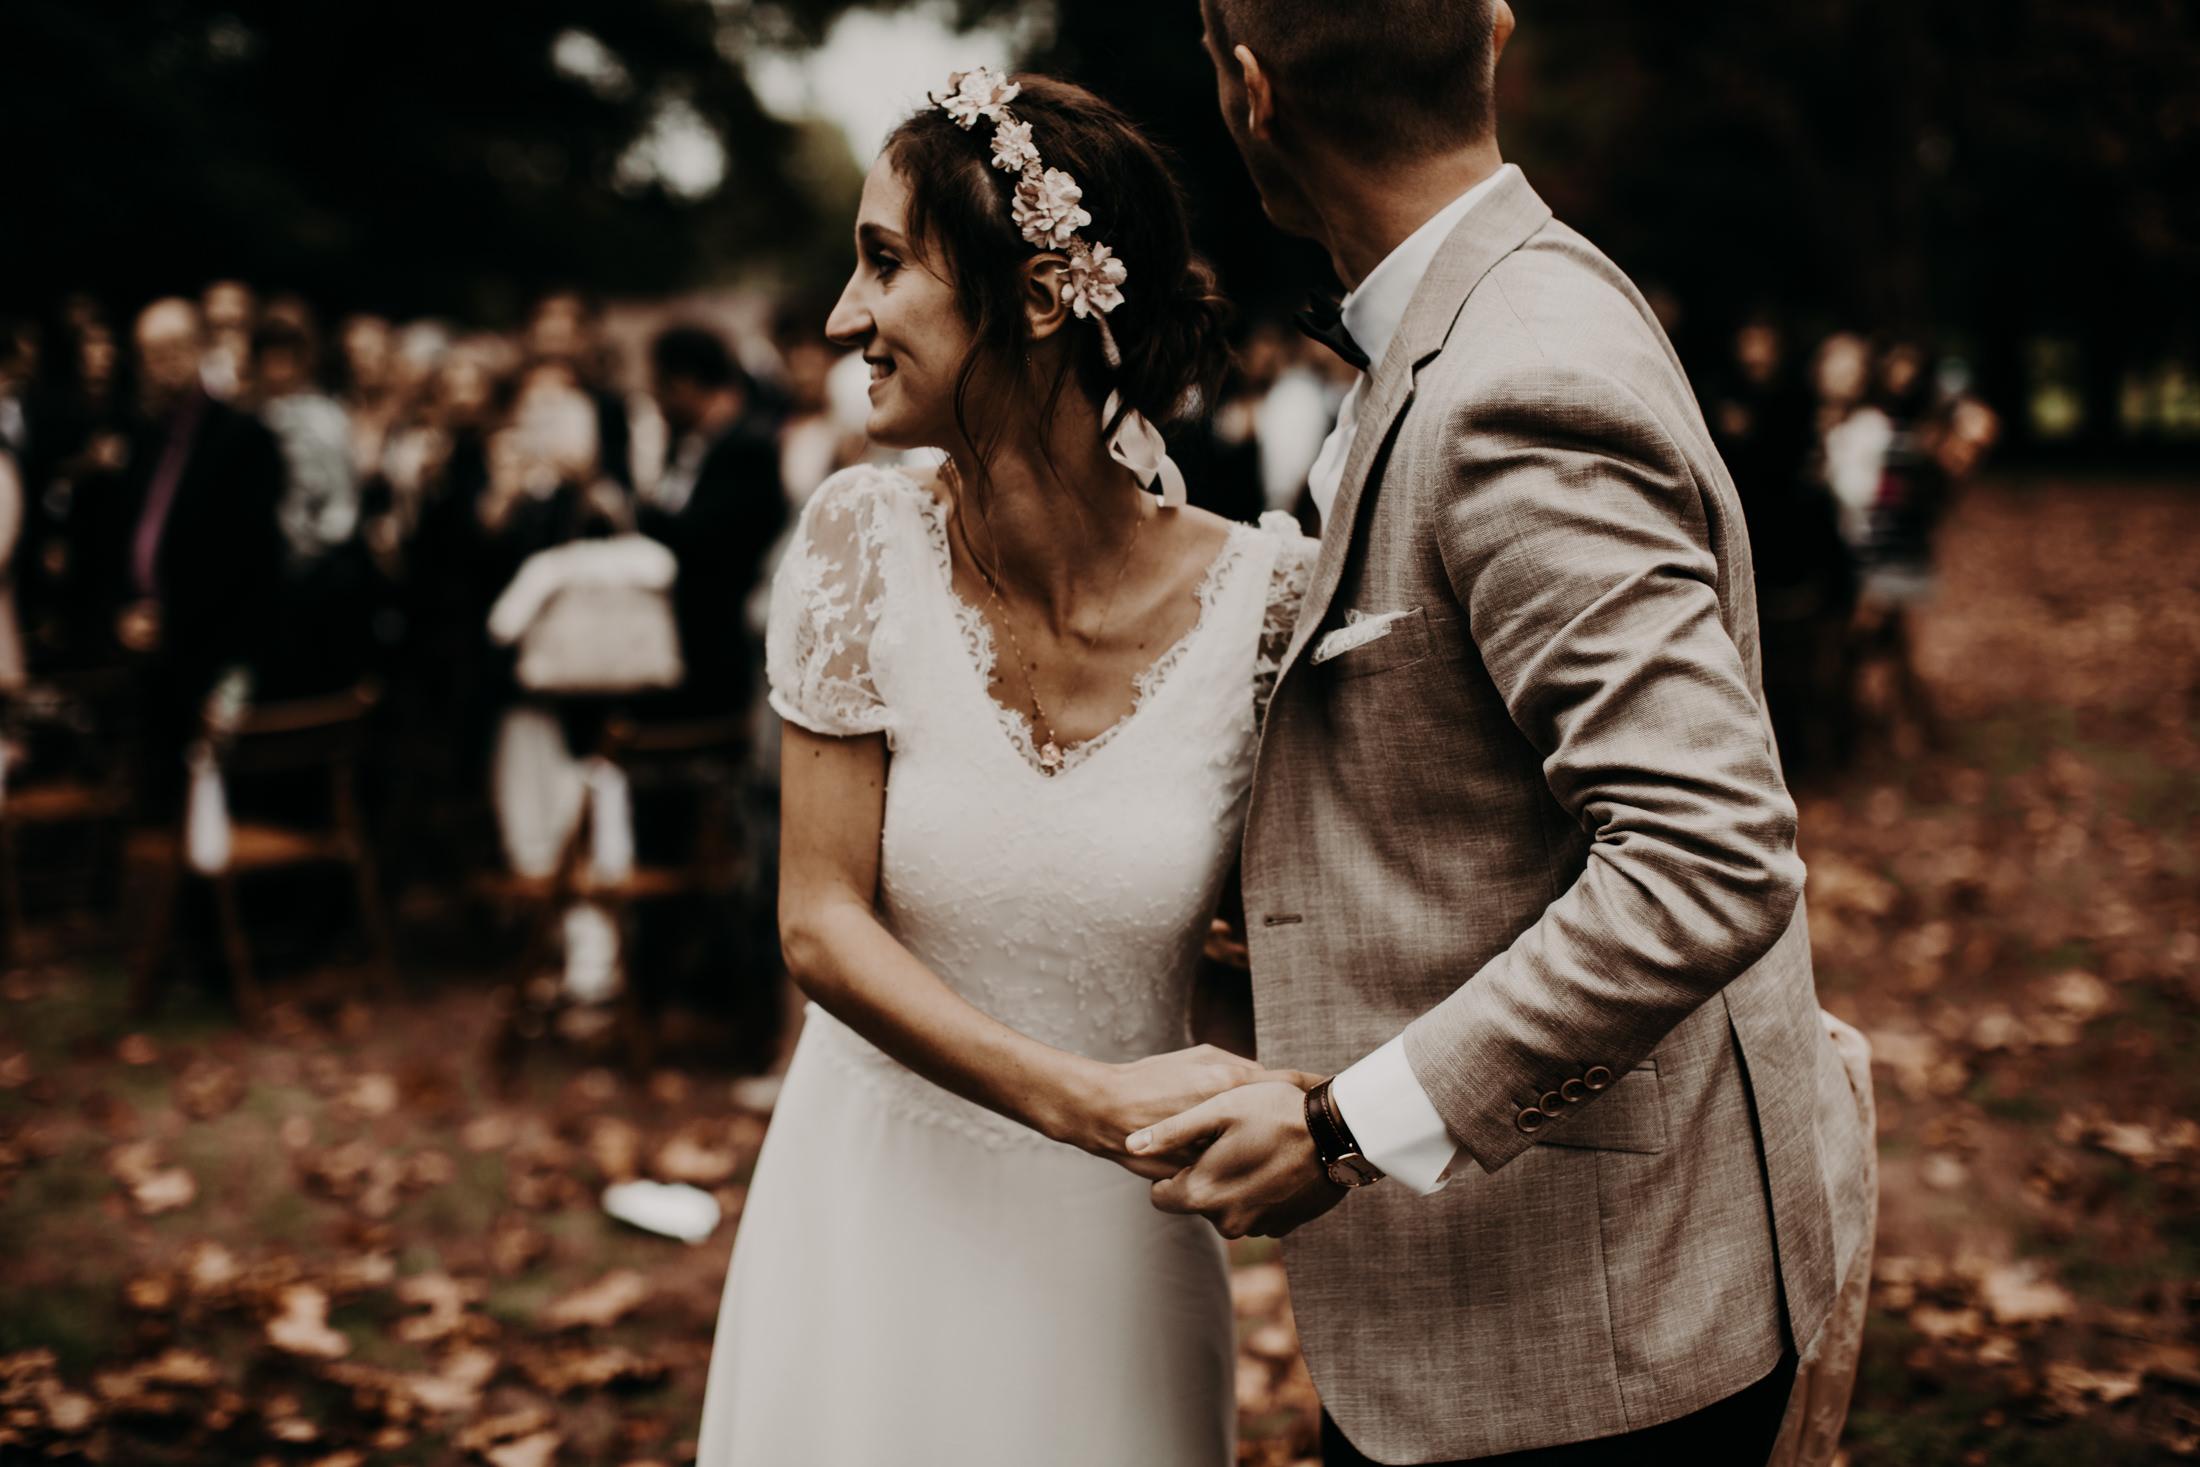 Mariage auvergne photographe wedding_-84.jpg